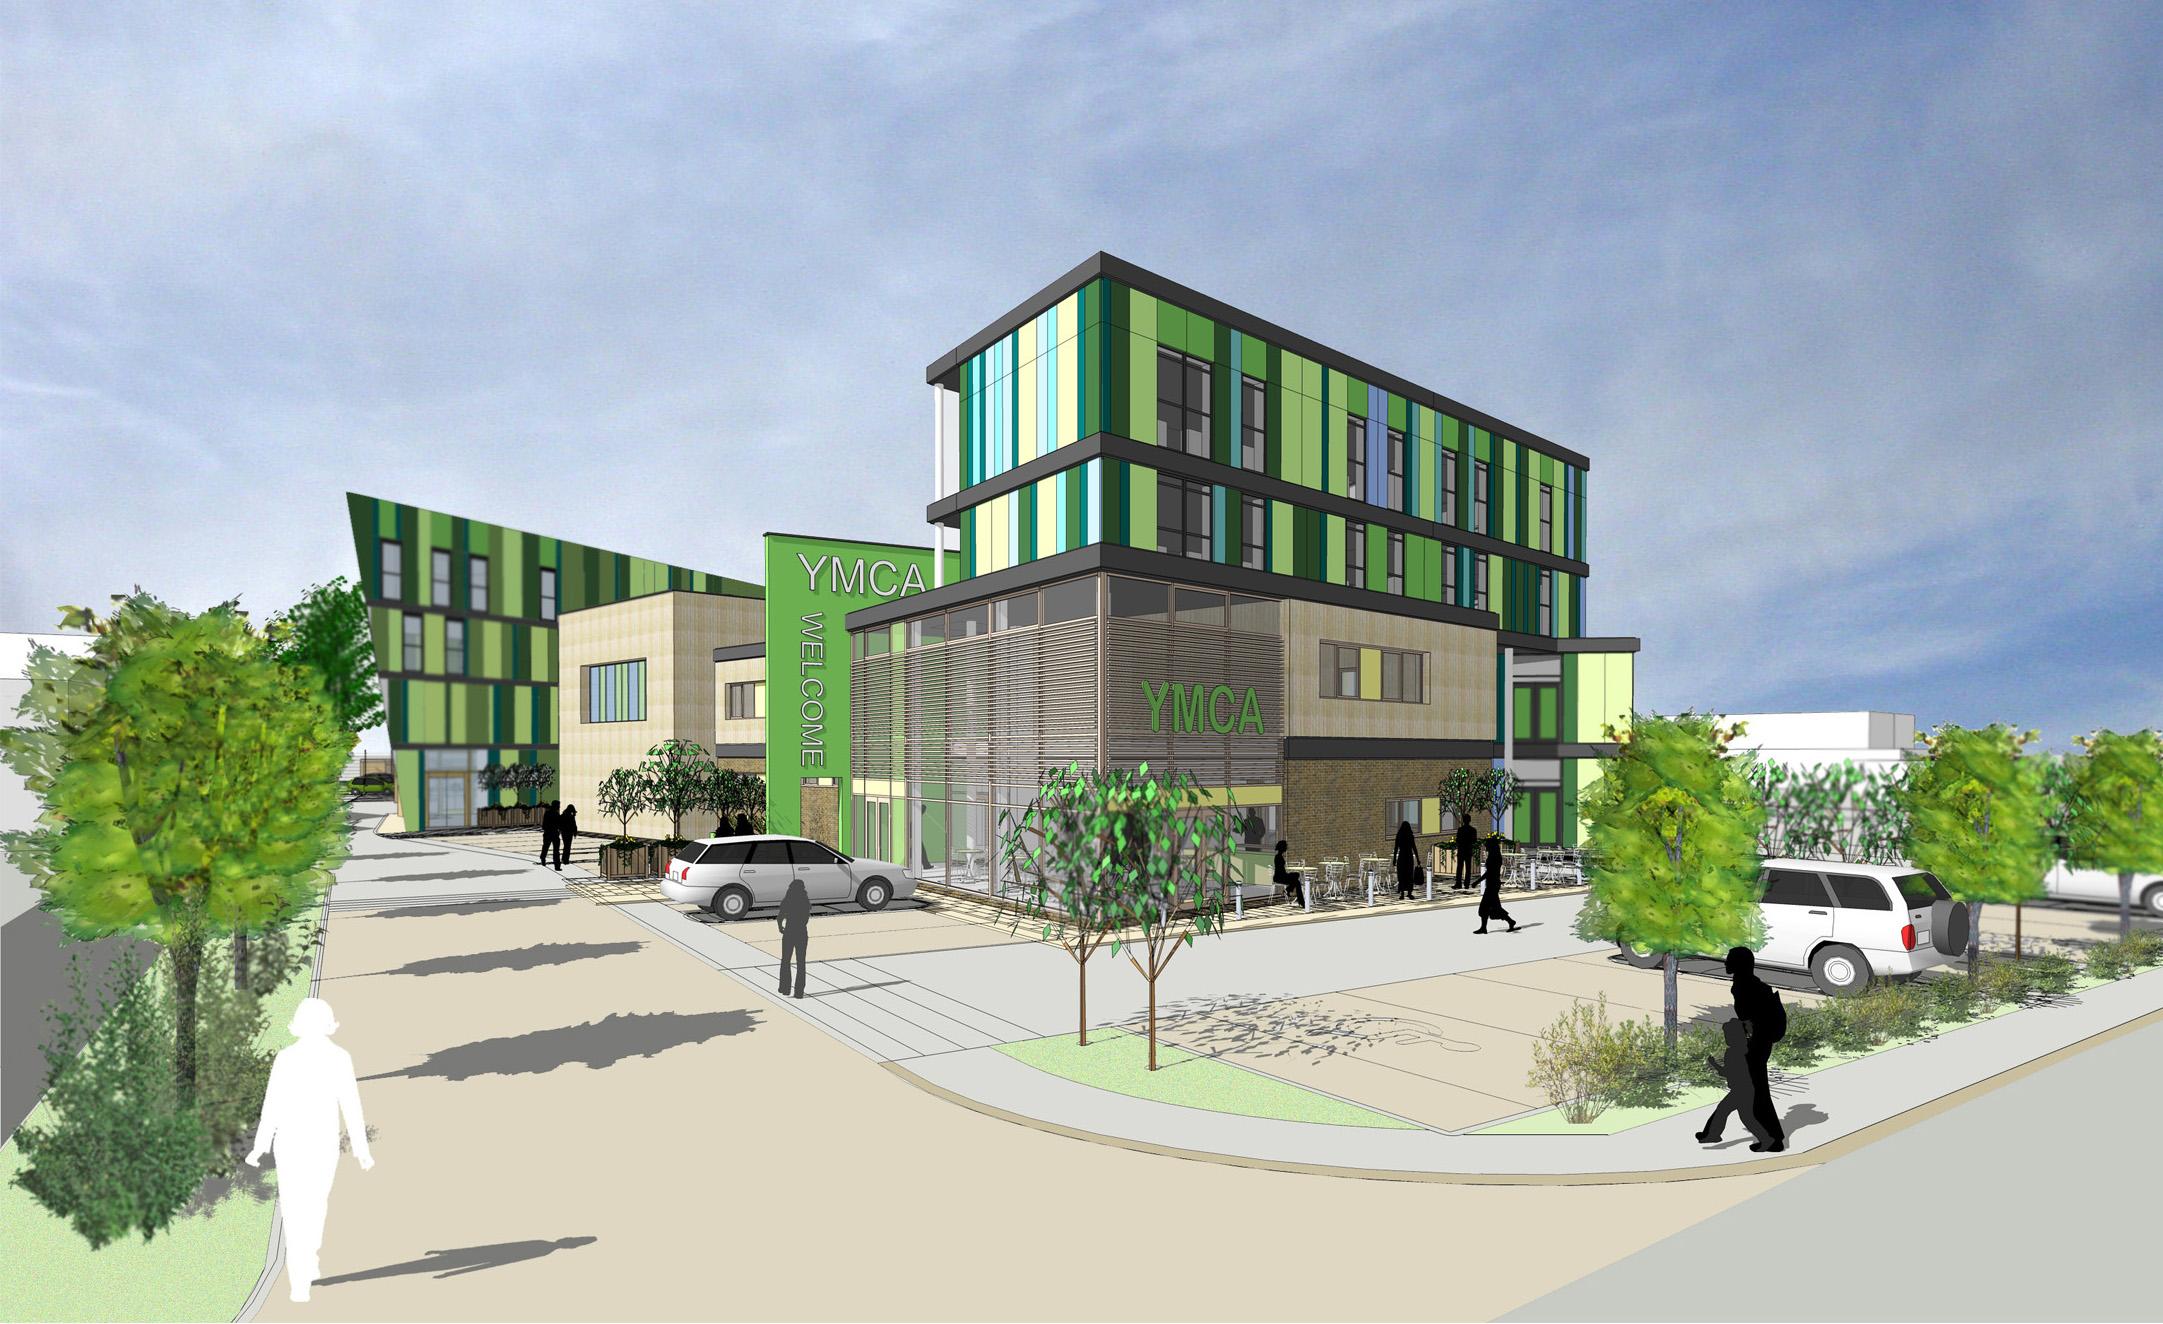 Birmingham-YMCA-artist-impression-building